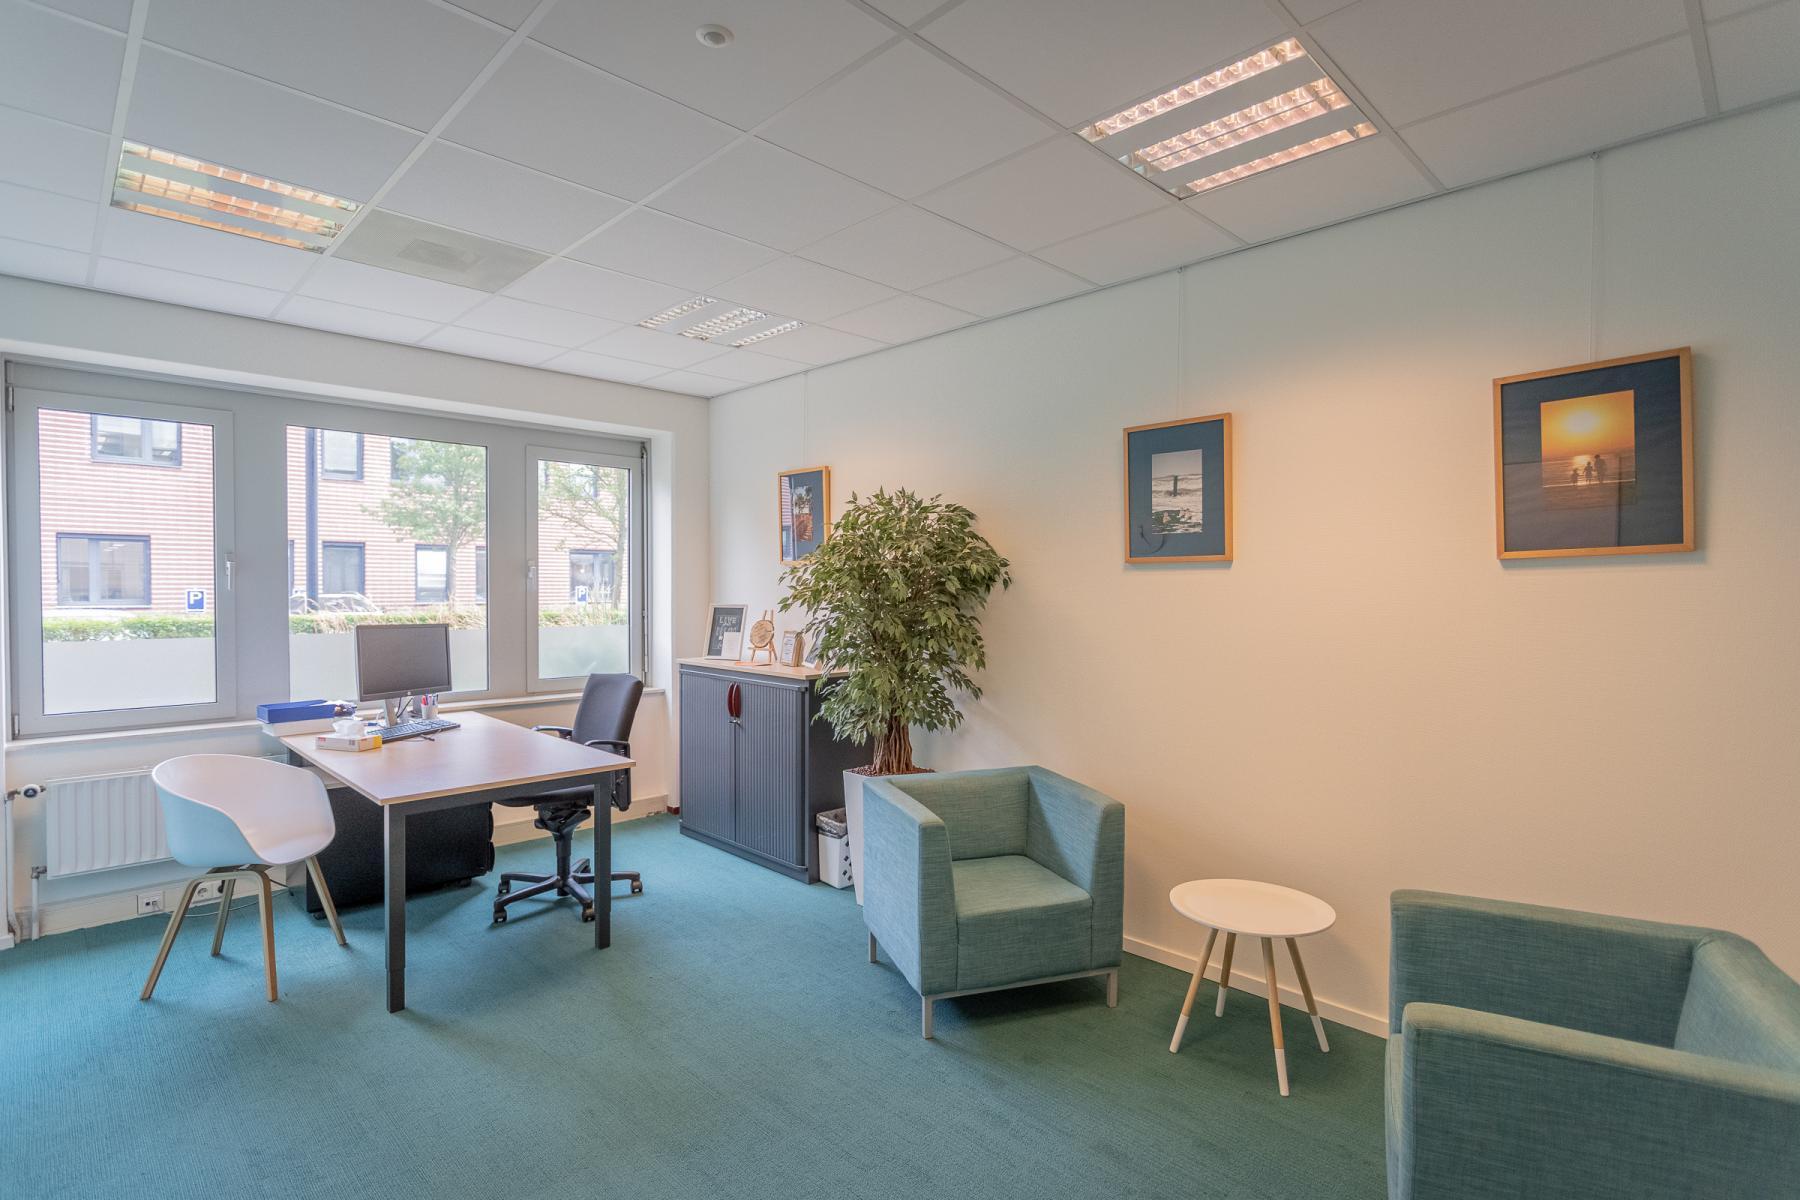 Rent office space Dokter Stolteweg 42, Zwolle (2)